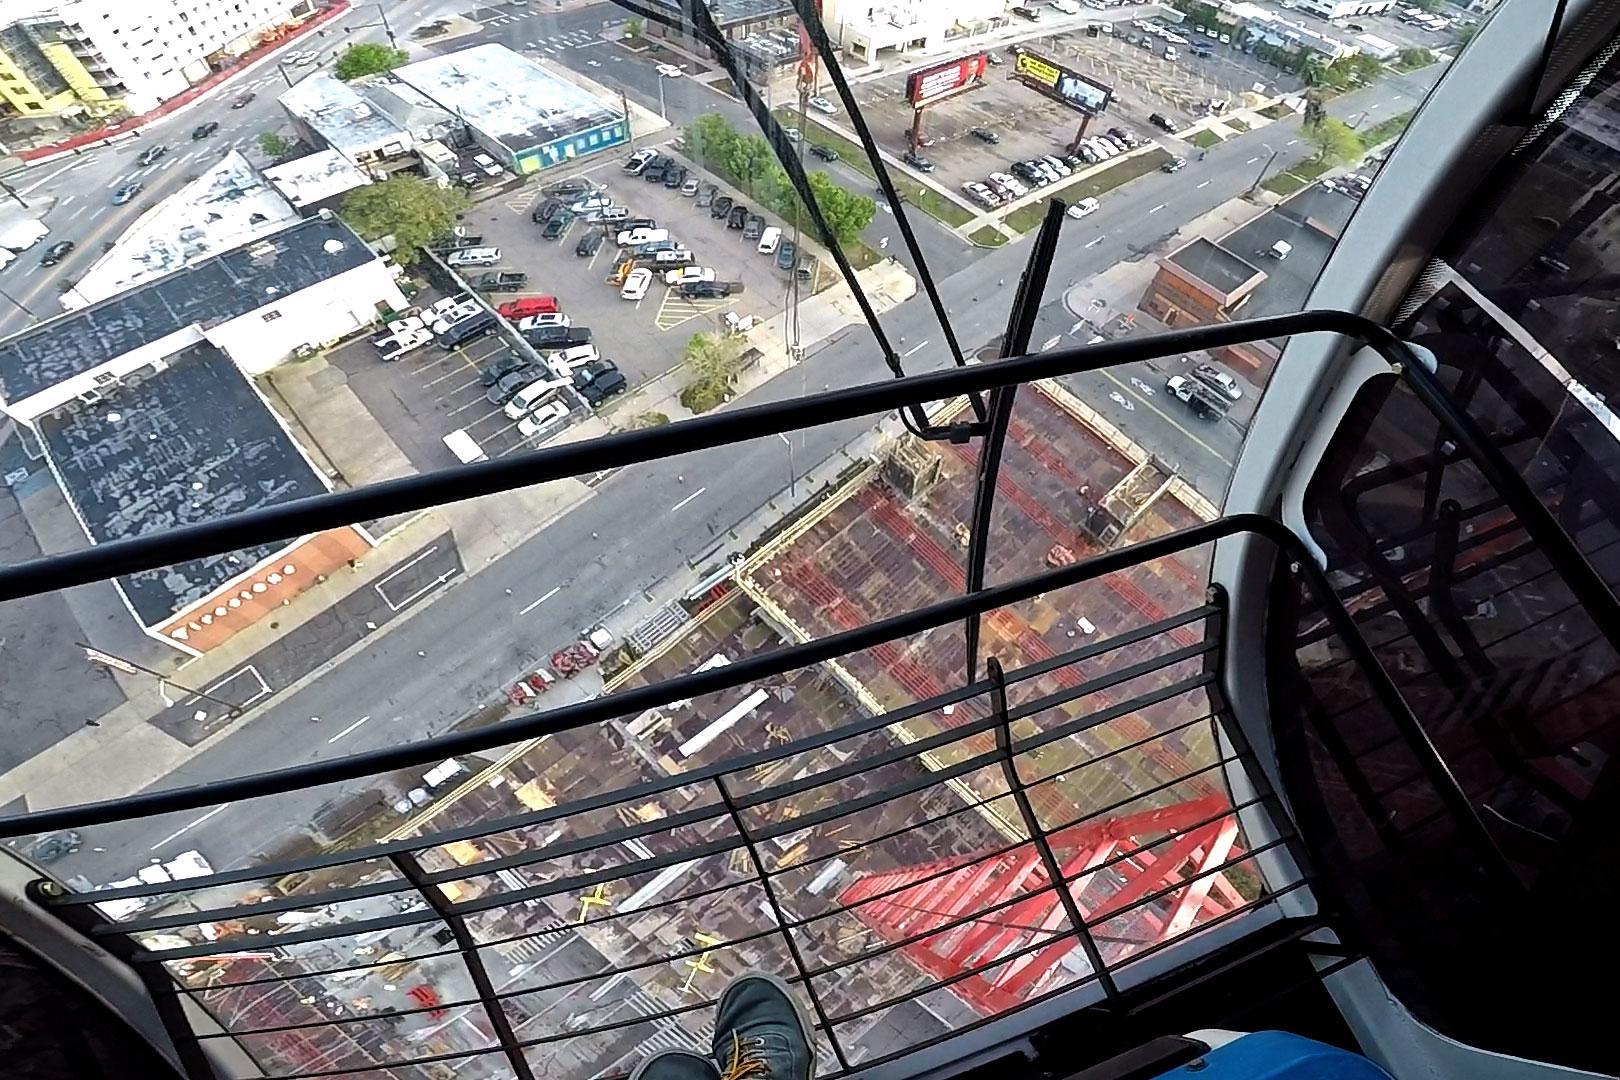 Photo: Crane Story In The Crane